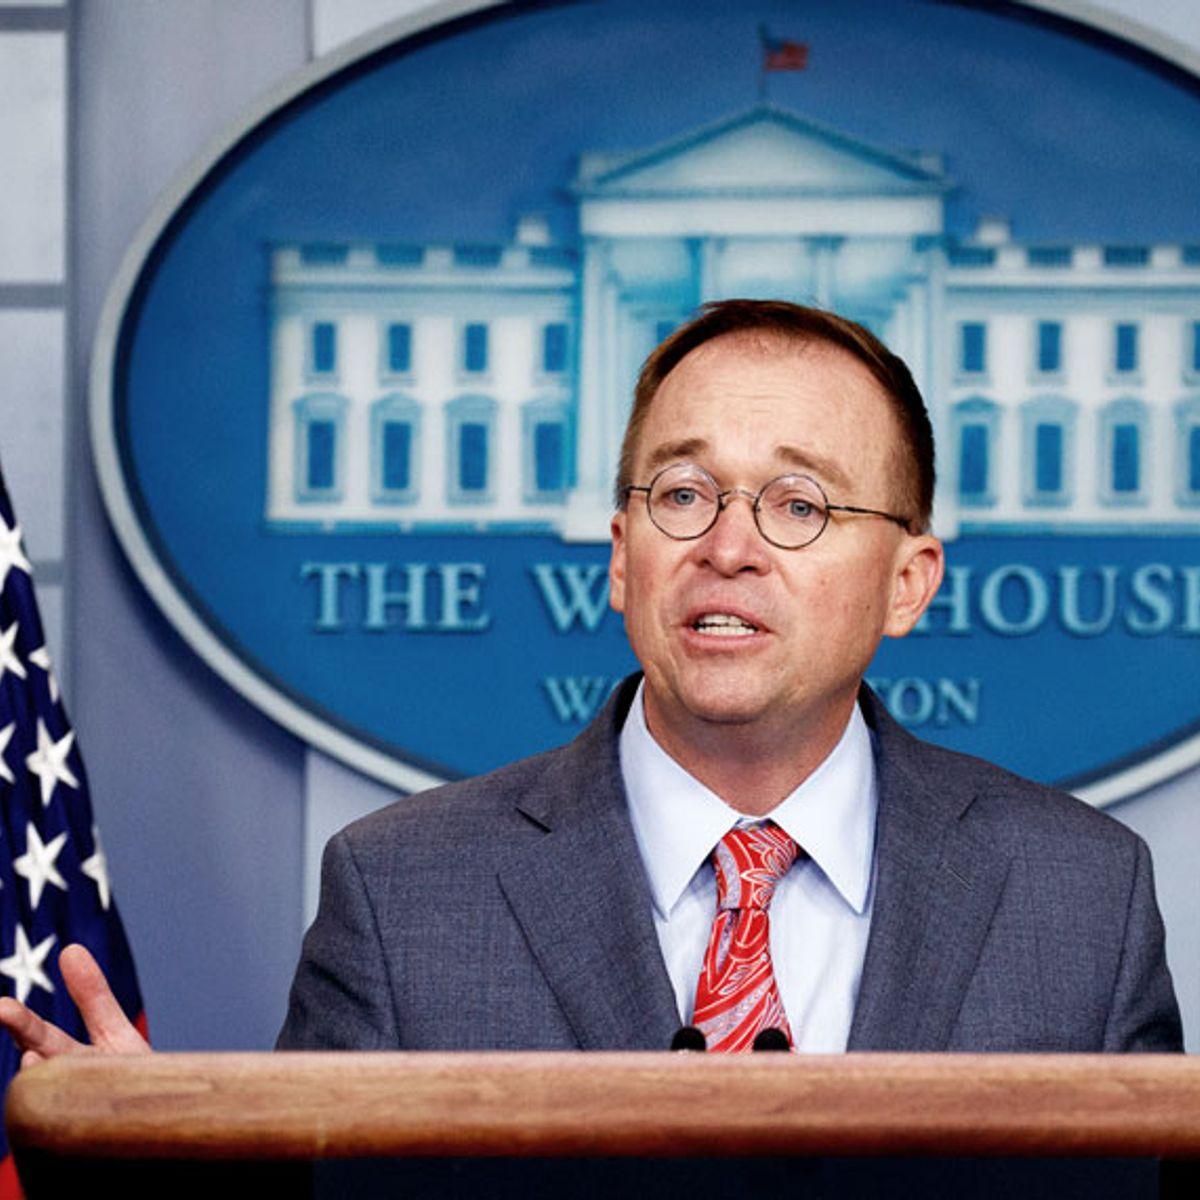 Mick Mulvaney undercuts Trump defense, admits Ukraine aid was blocked to force investigation